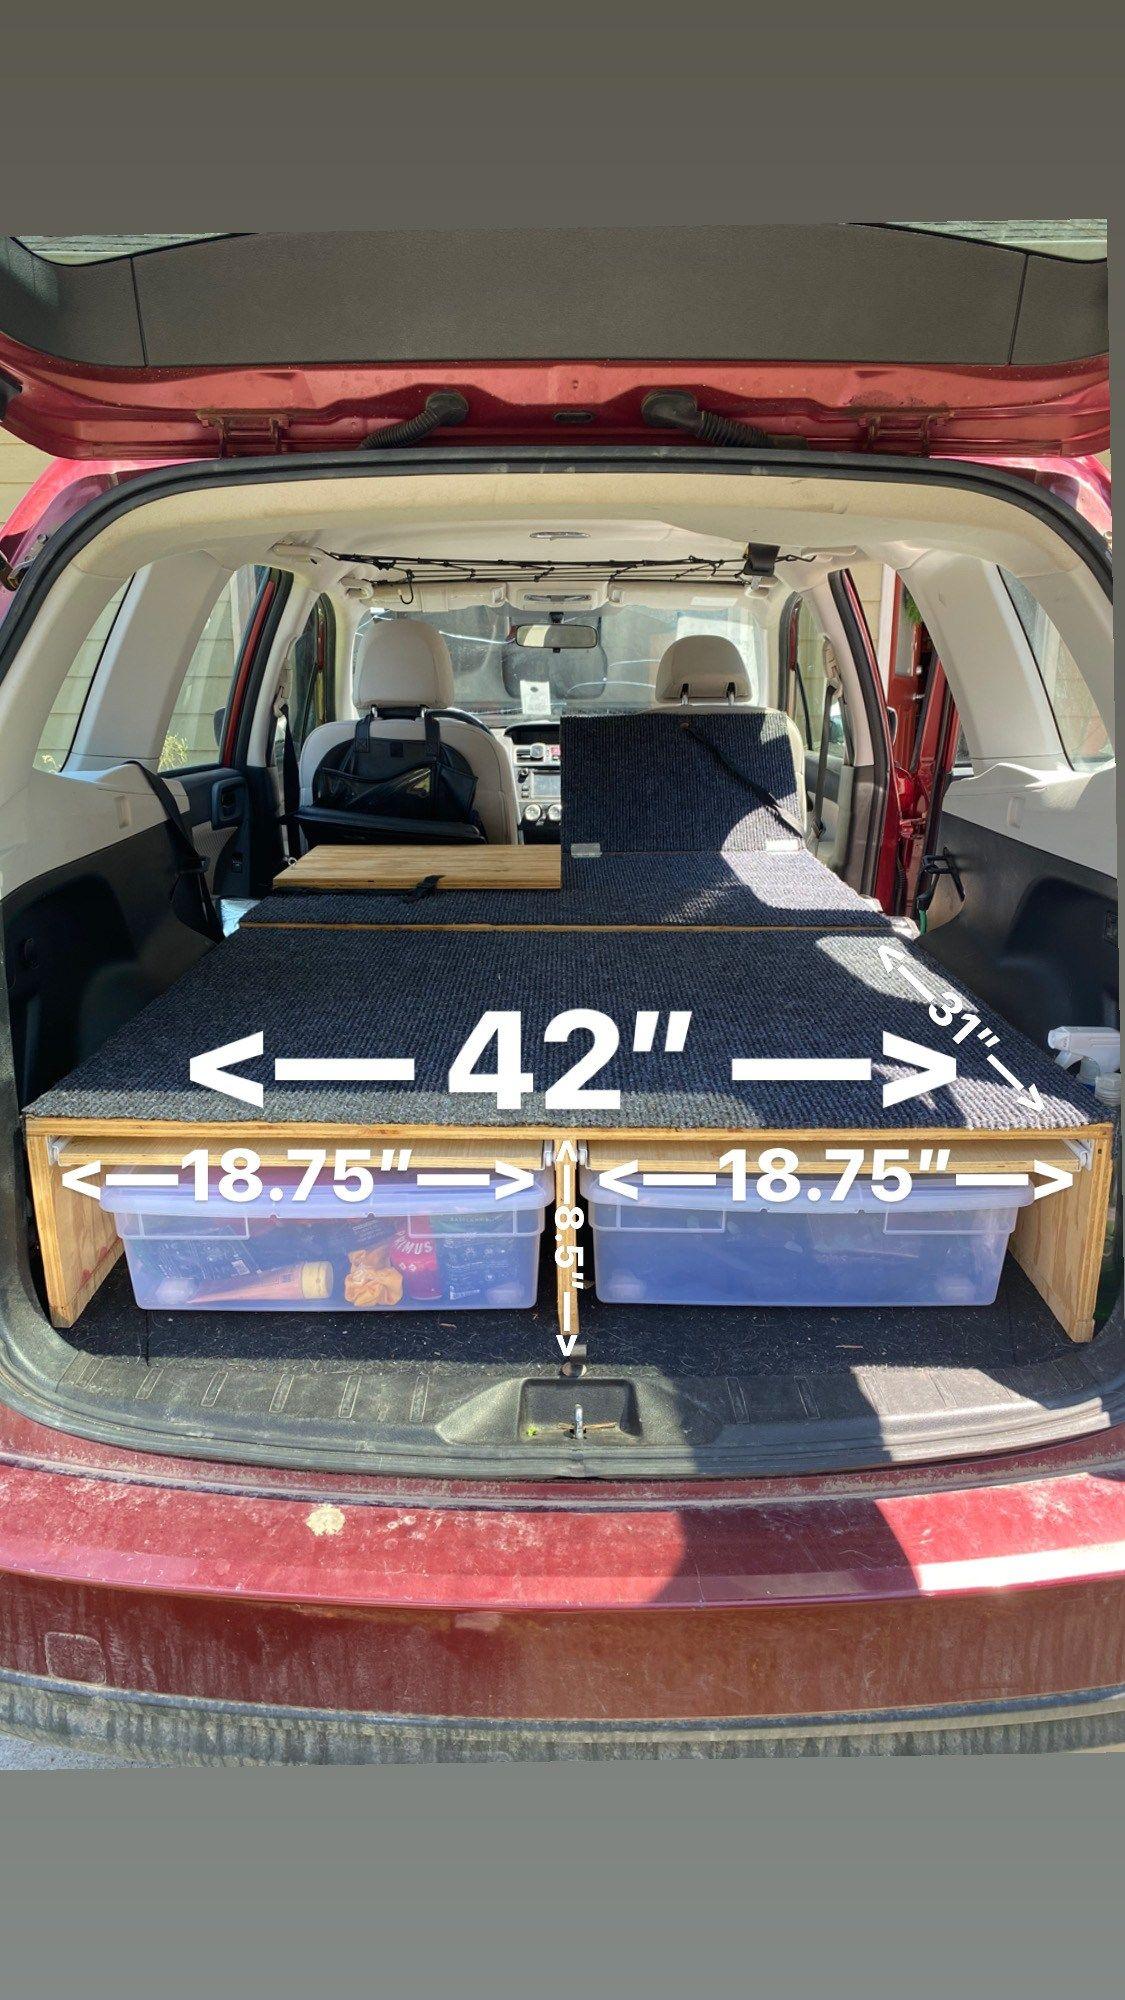 Suv Camper Conversion With Sleeping Platform Subaru Forester Bonjour Becky Suv Camper Subaru Forester Suv Camping